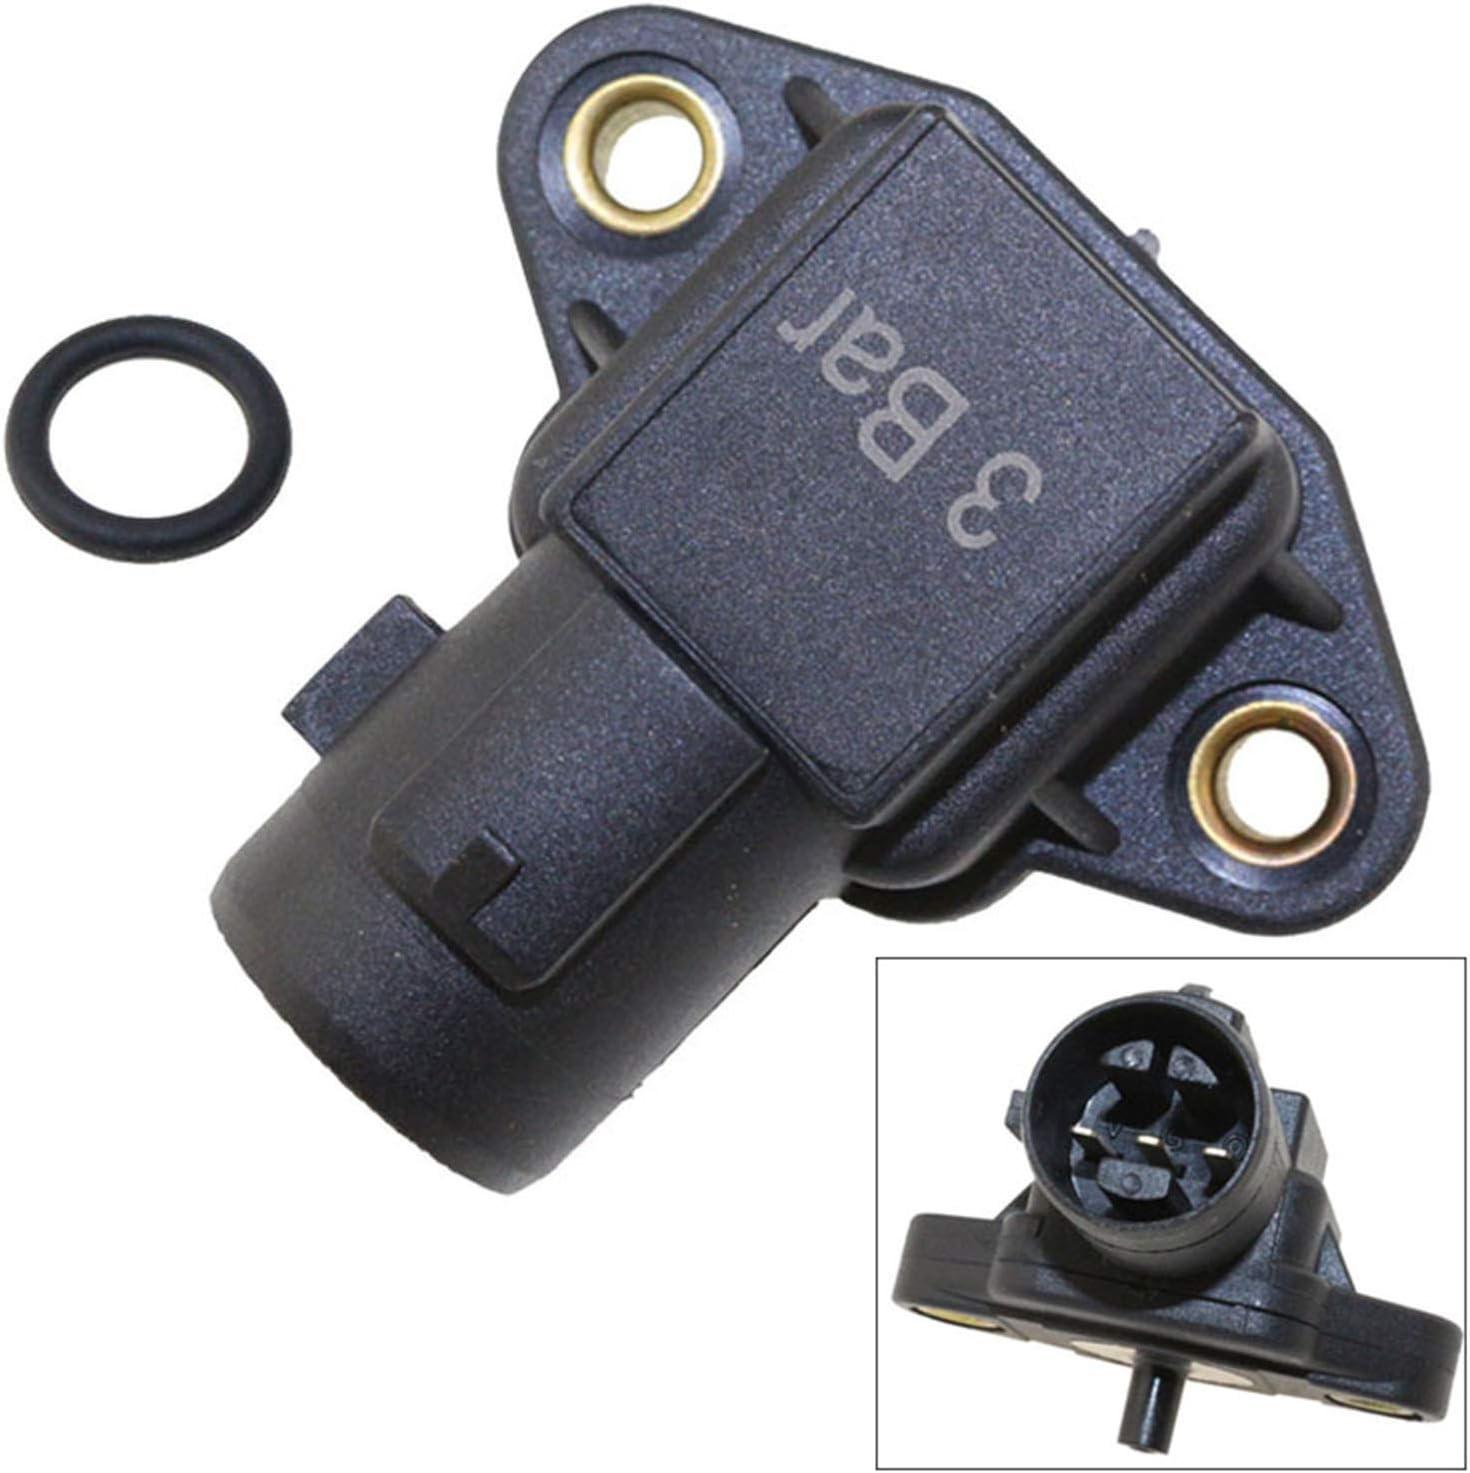 MAP Acura CL TL Integra Sensor 079800-4250 Replacement for Honda Civic Del Sol Accord CR-V HR-V Crx Odyssey Prelude S2000,Isuzu Oasis CENTAURUS Manifold Pressure # 37830-PAA-S00 37830-P05-A01